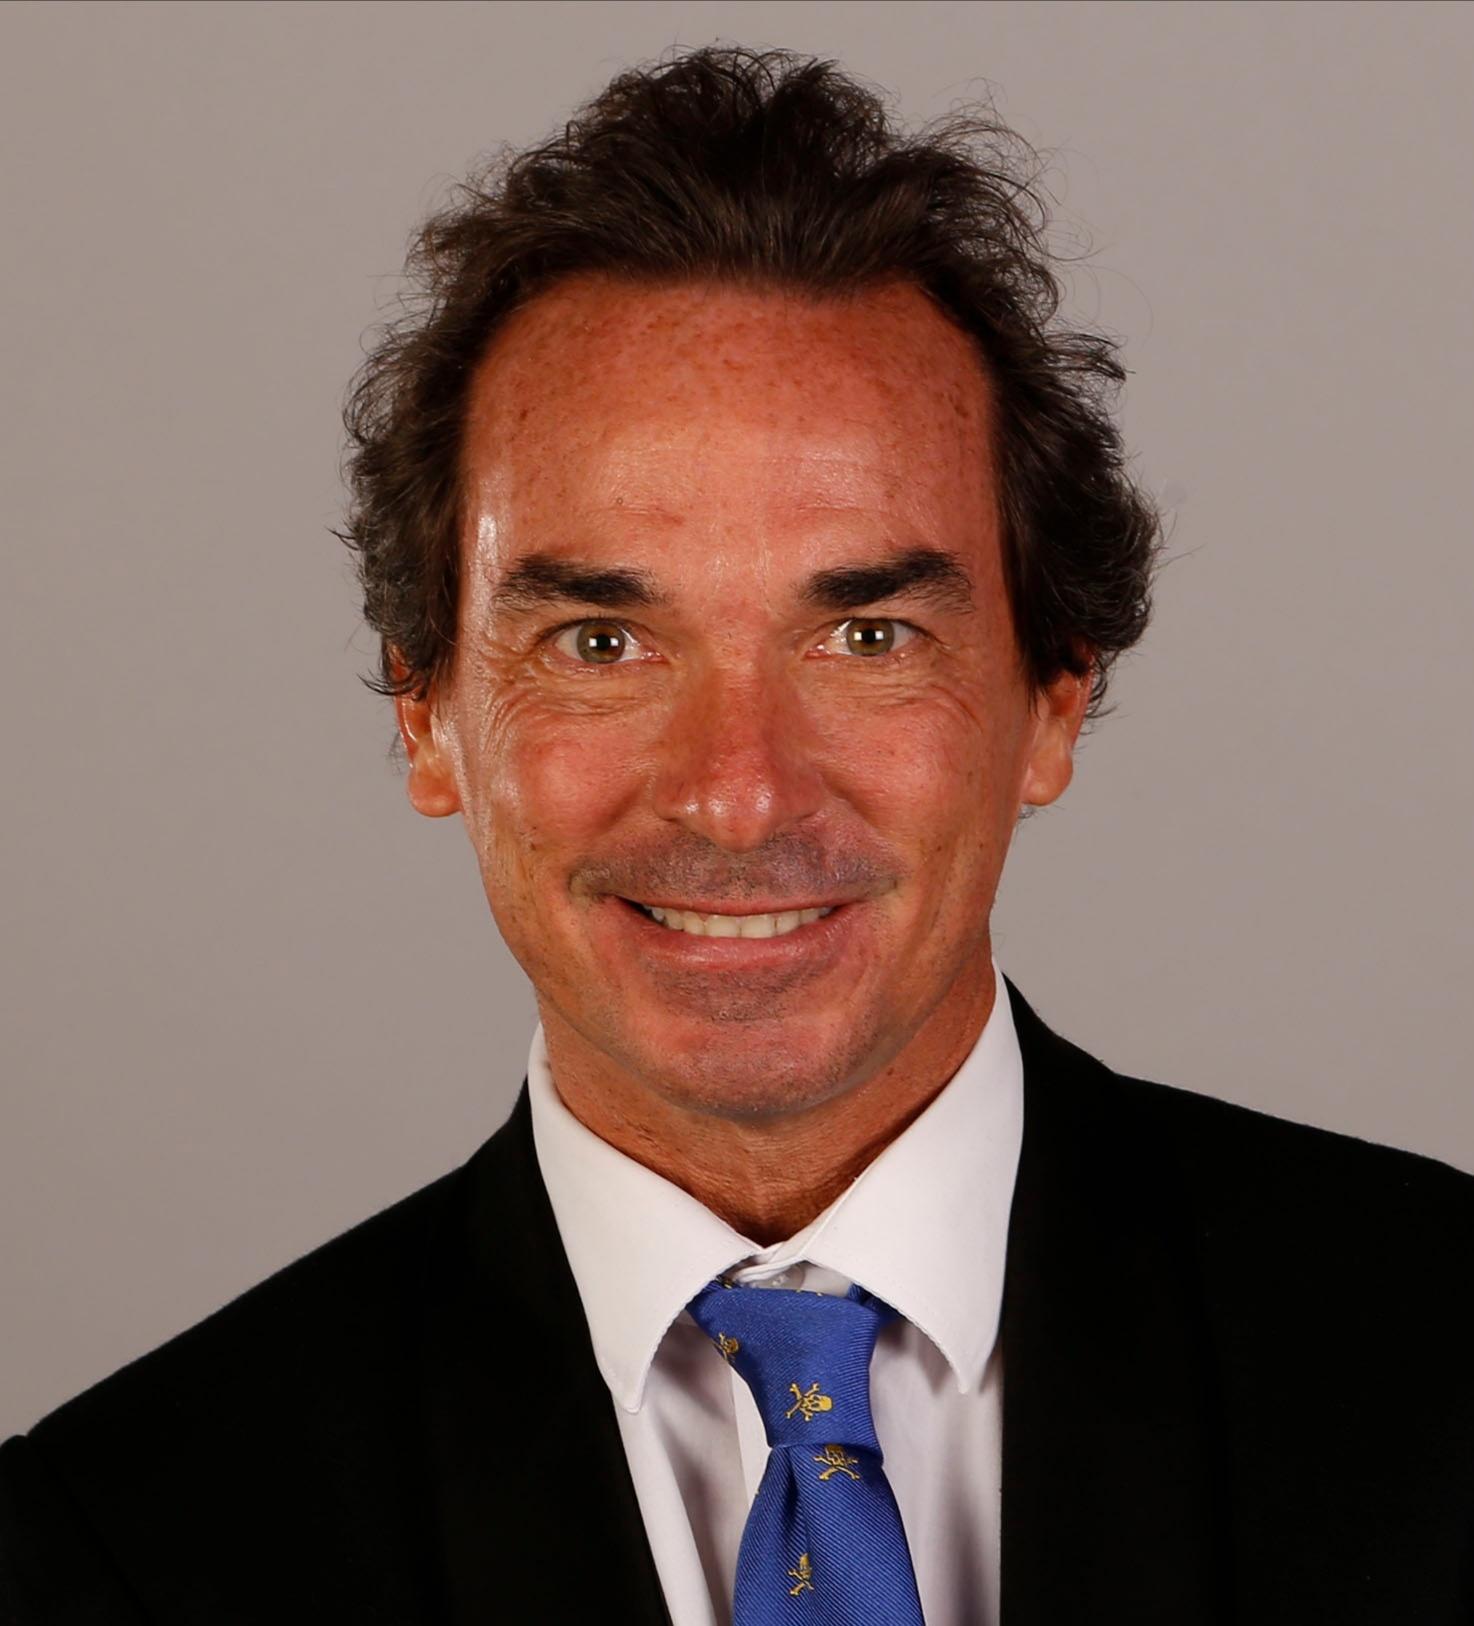 D. Javier Díez Medrano